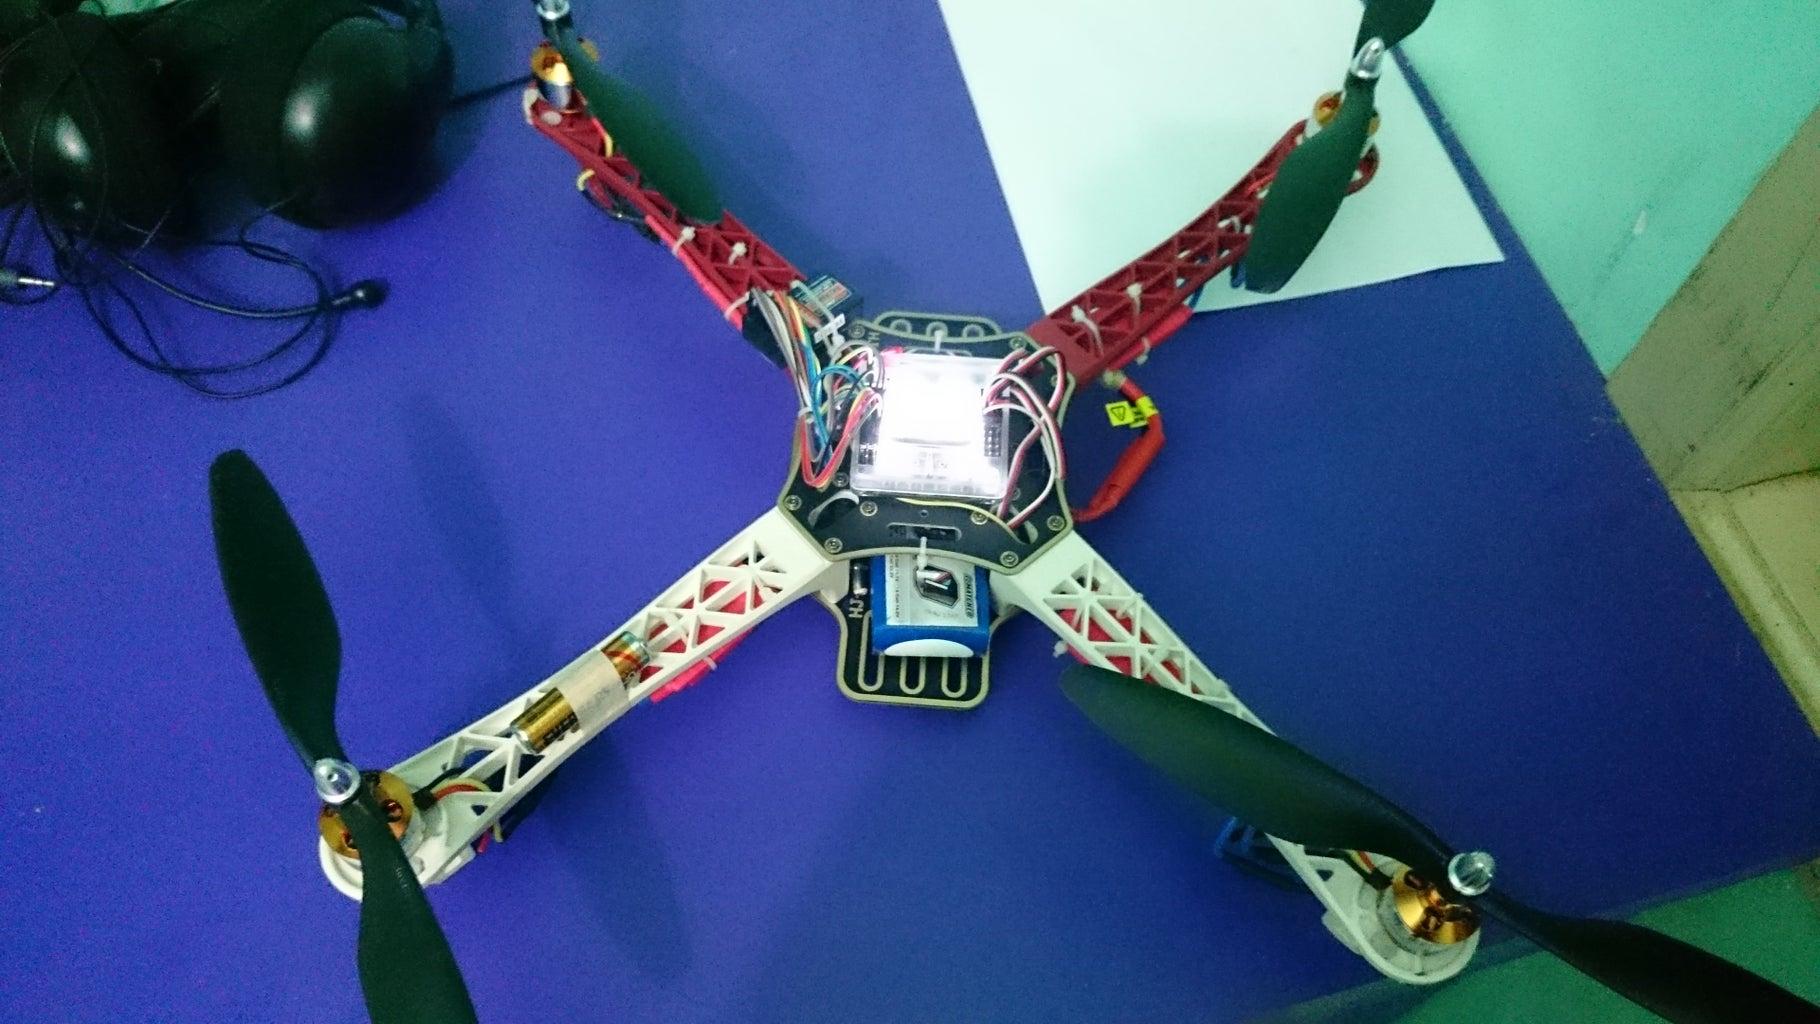 Finalizing the Drone and KK2 Setup